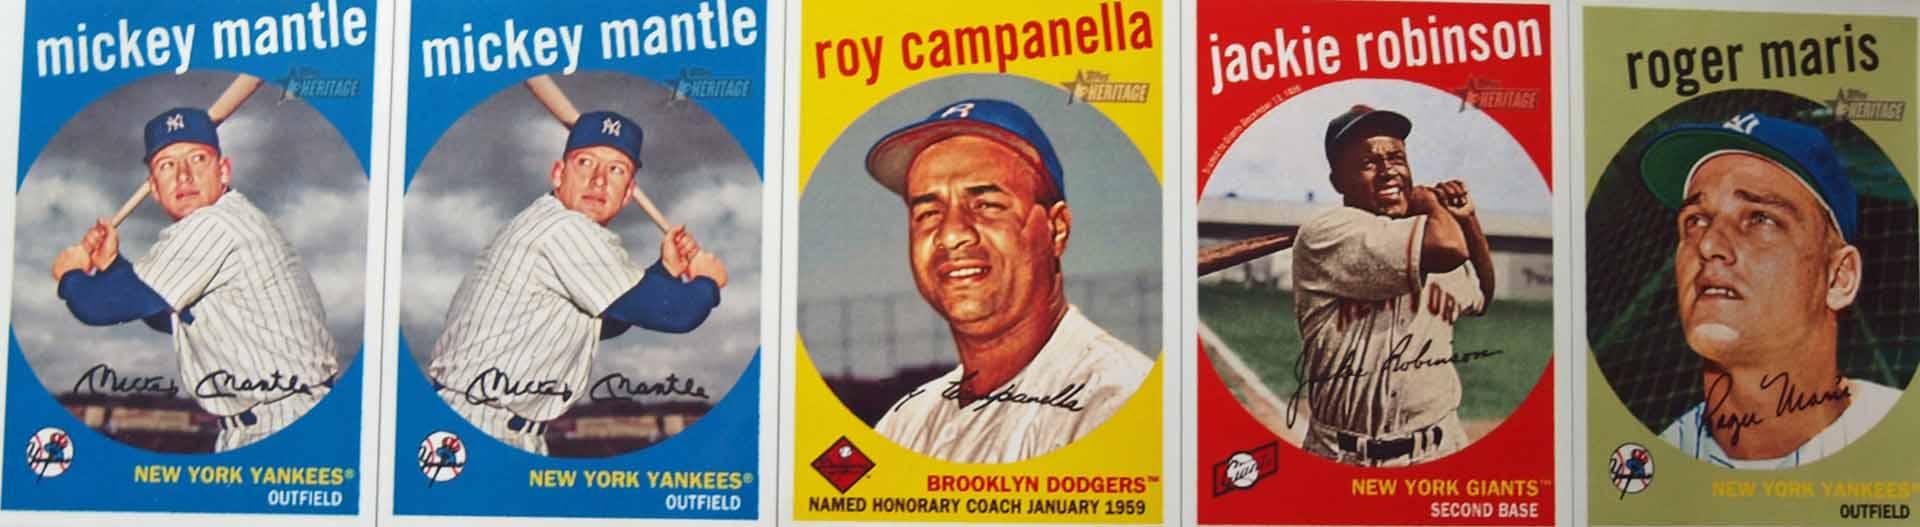 1960 era baseball photo facts